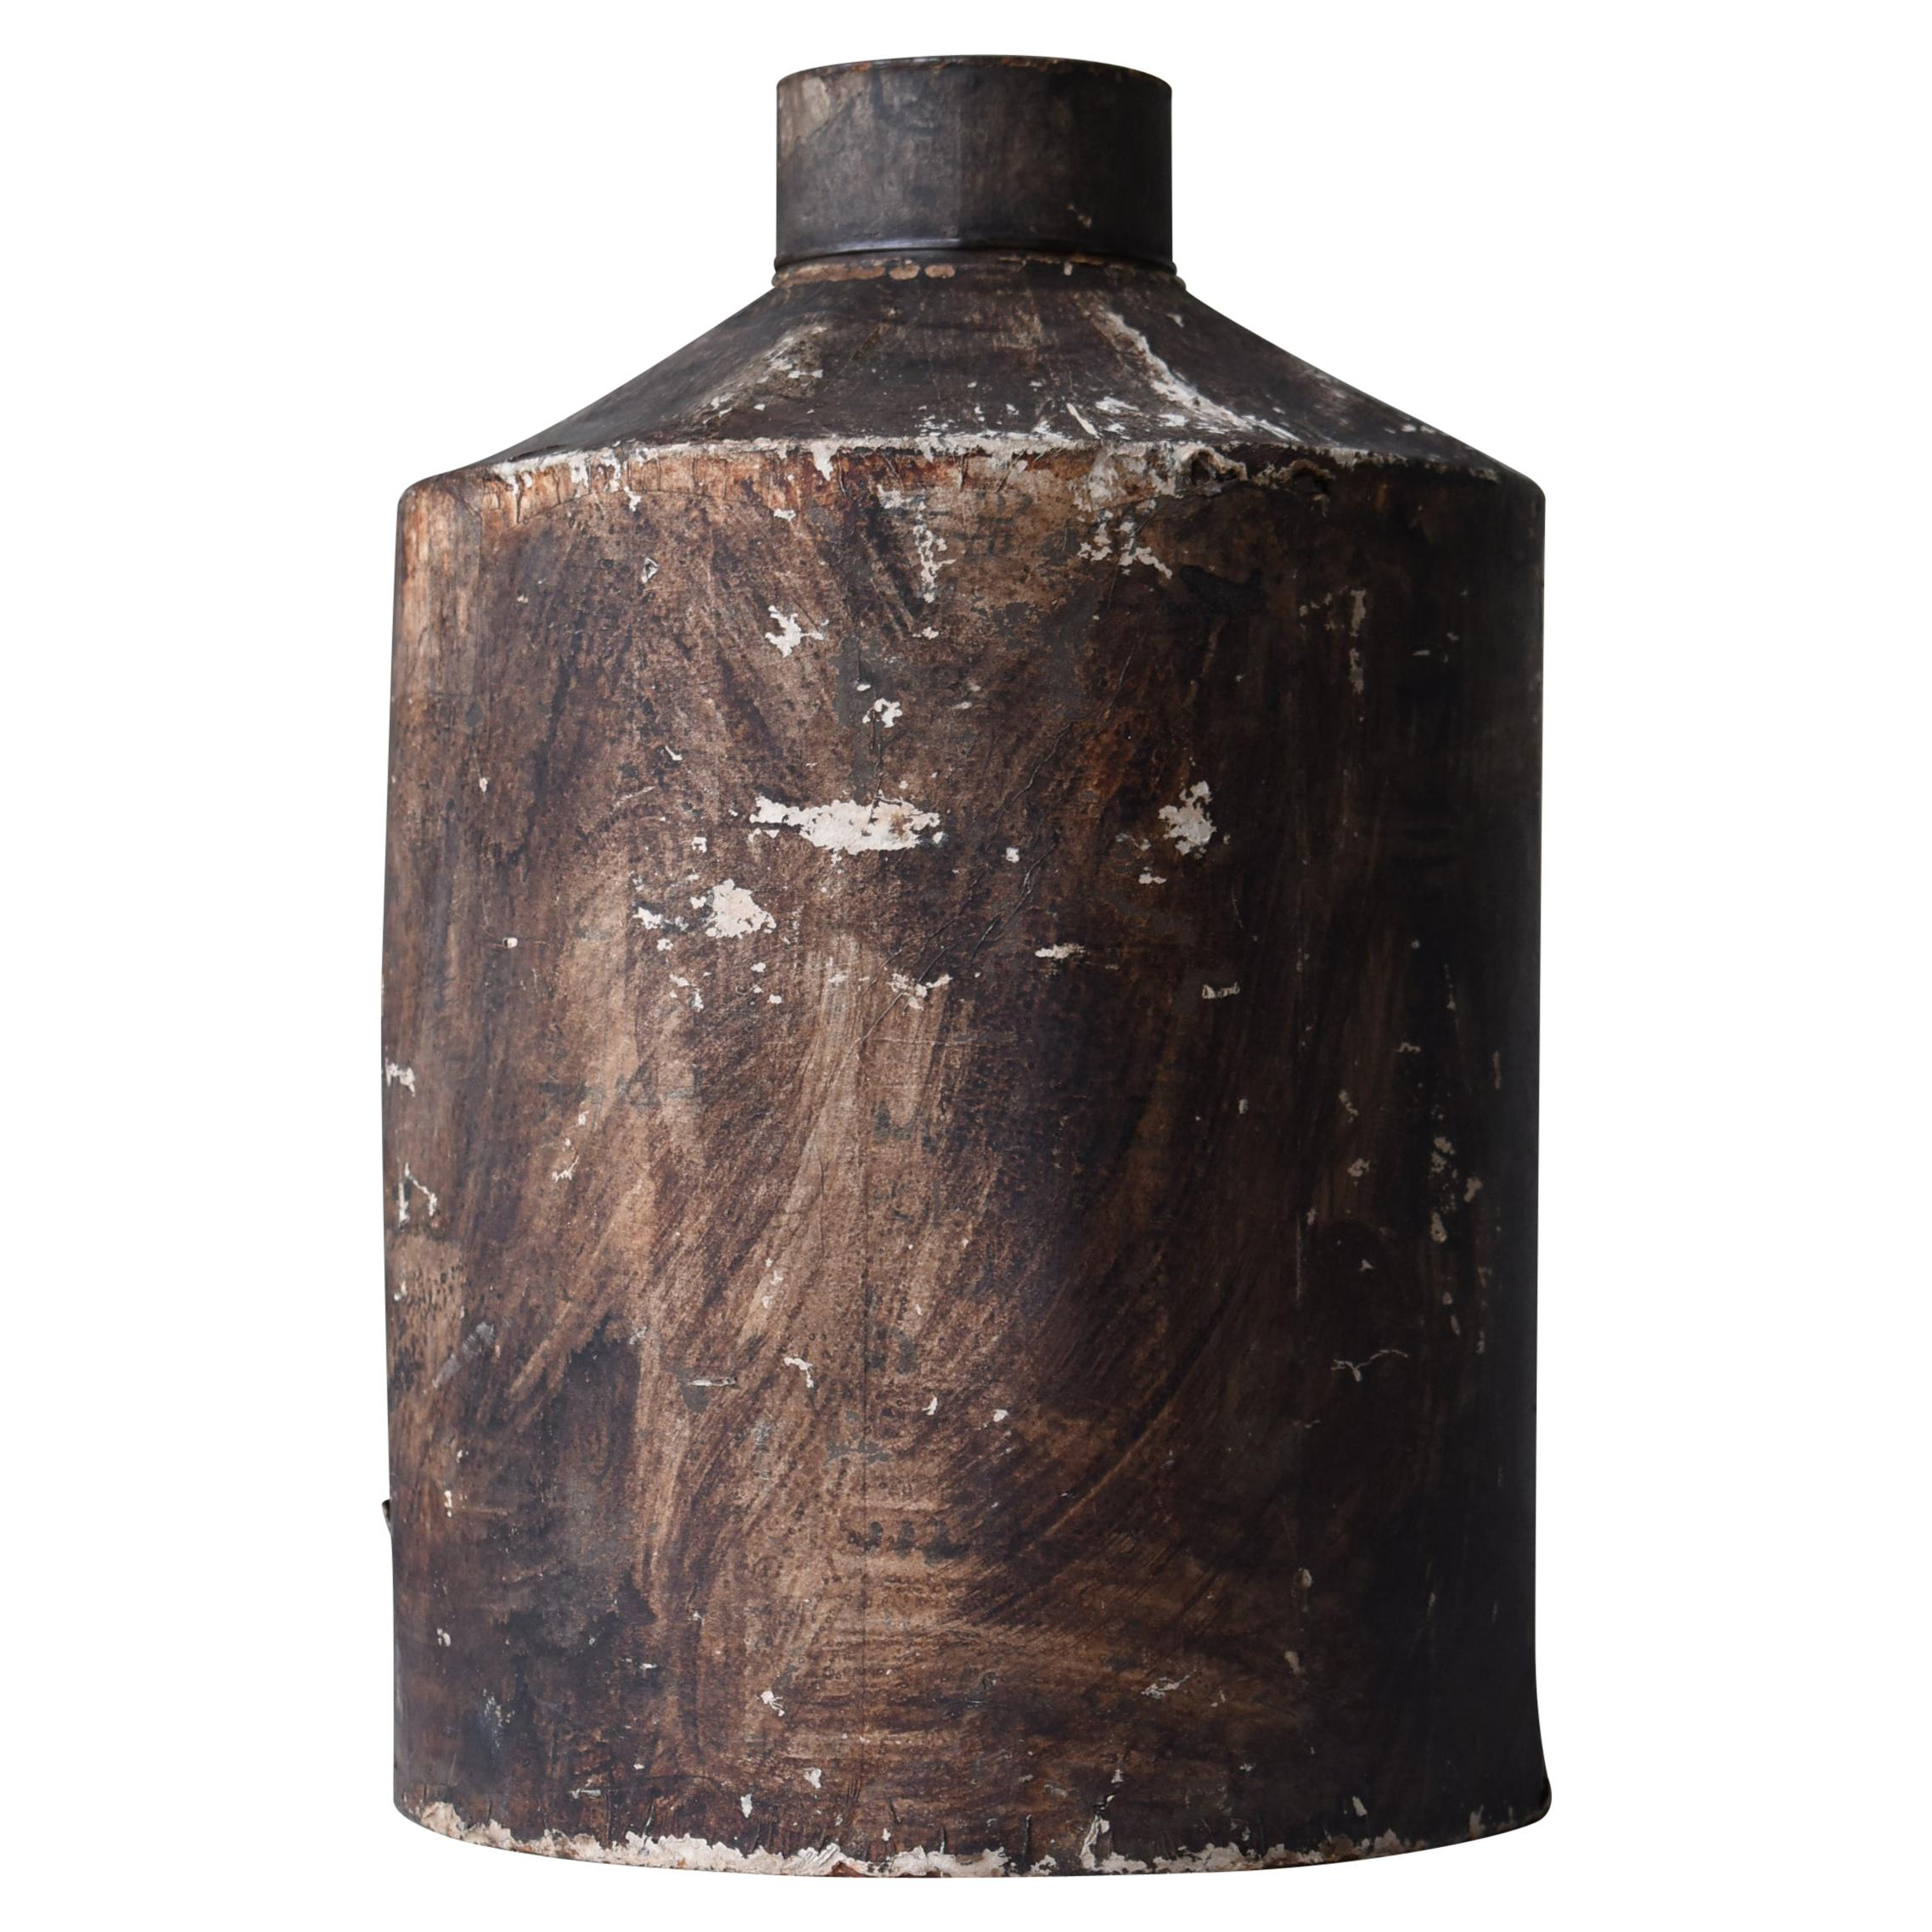 Japanese Old Tin Bottle 1900s-1940s/Antique Flower Vase Vessel Wabisabi Art